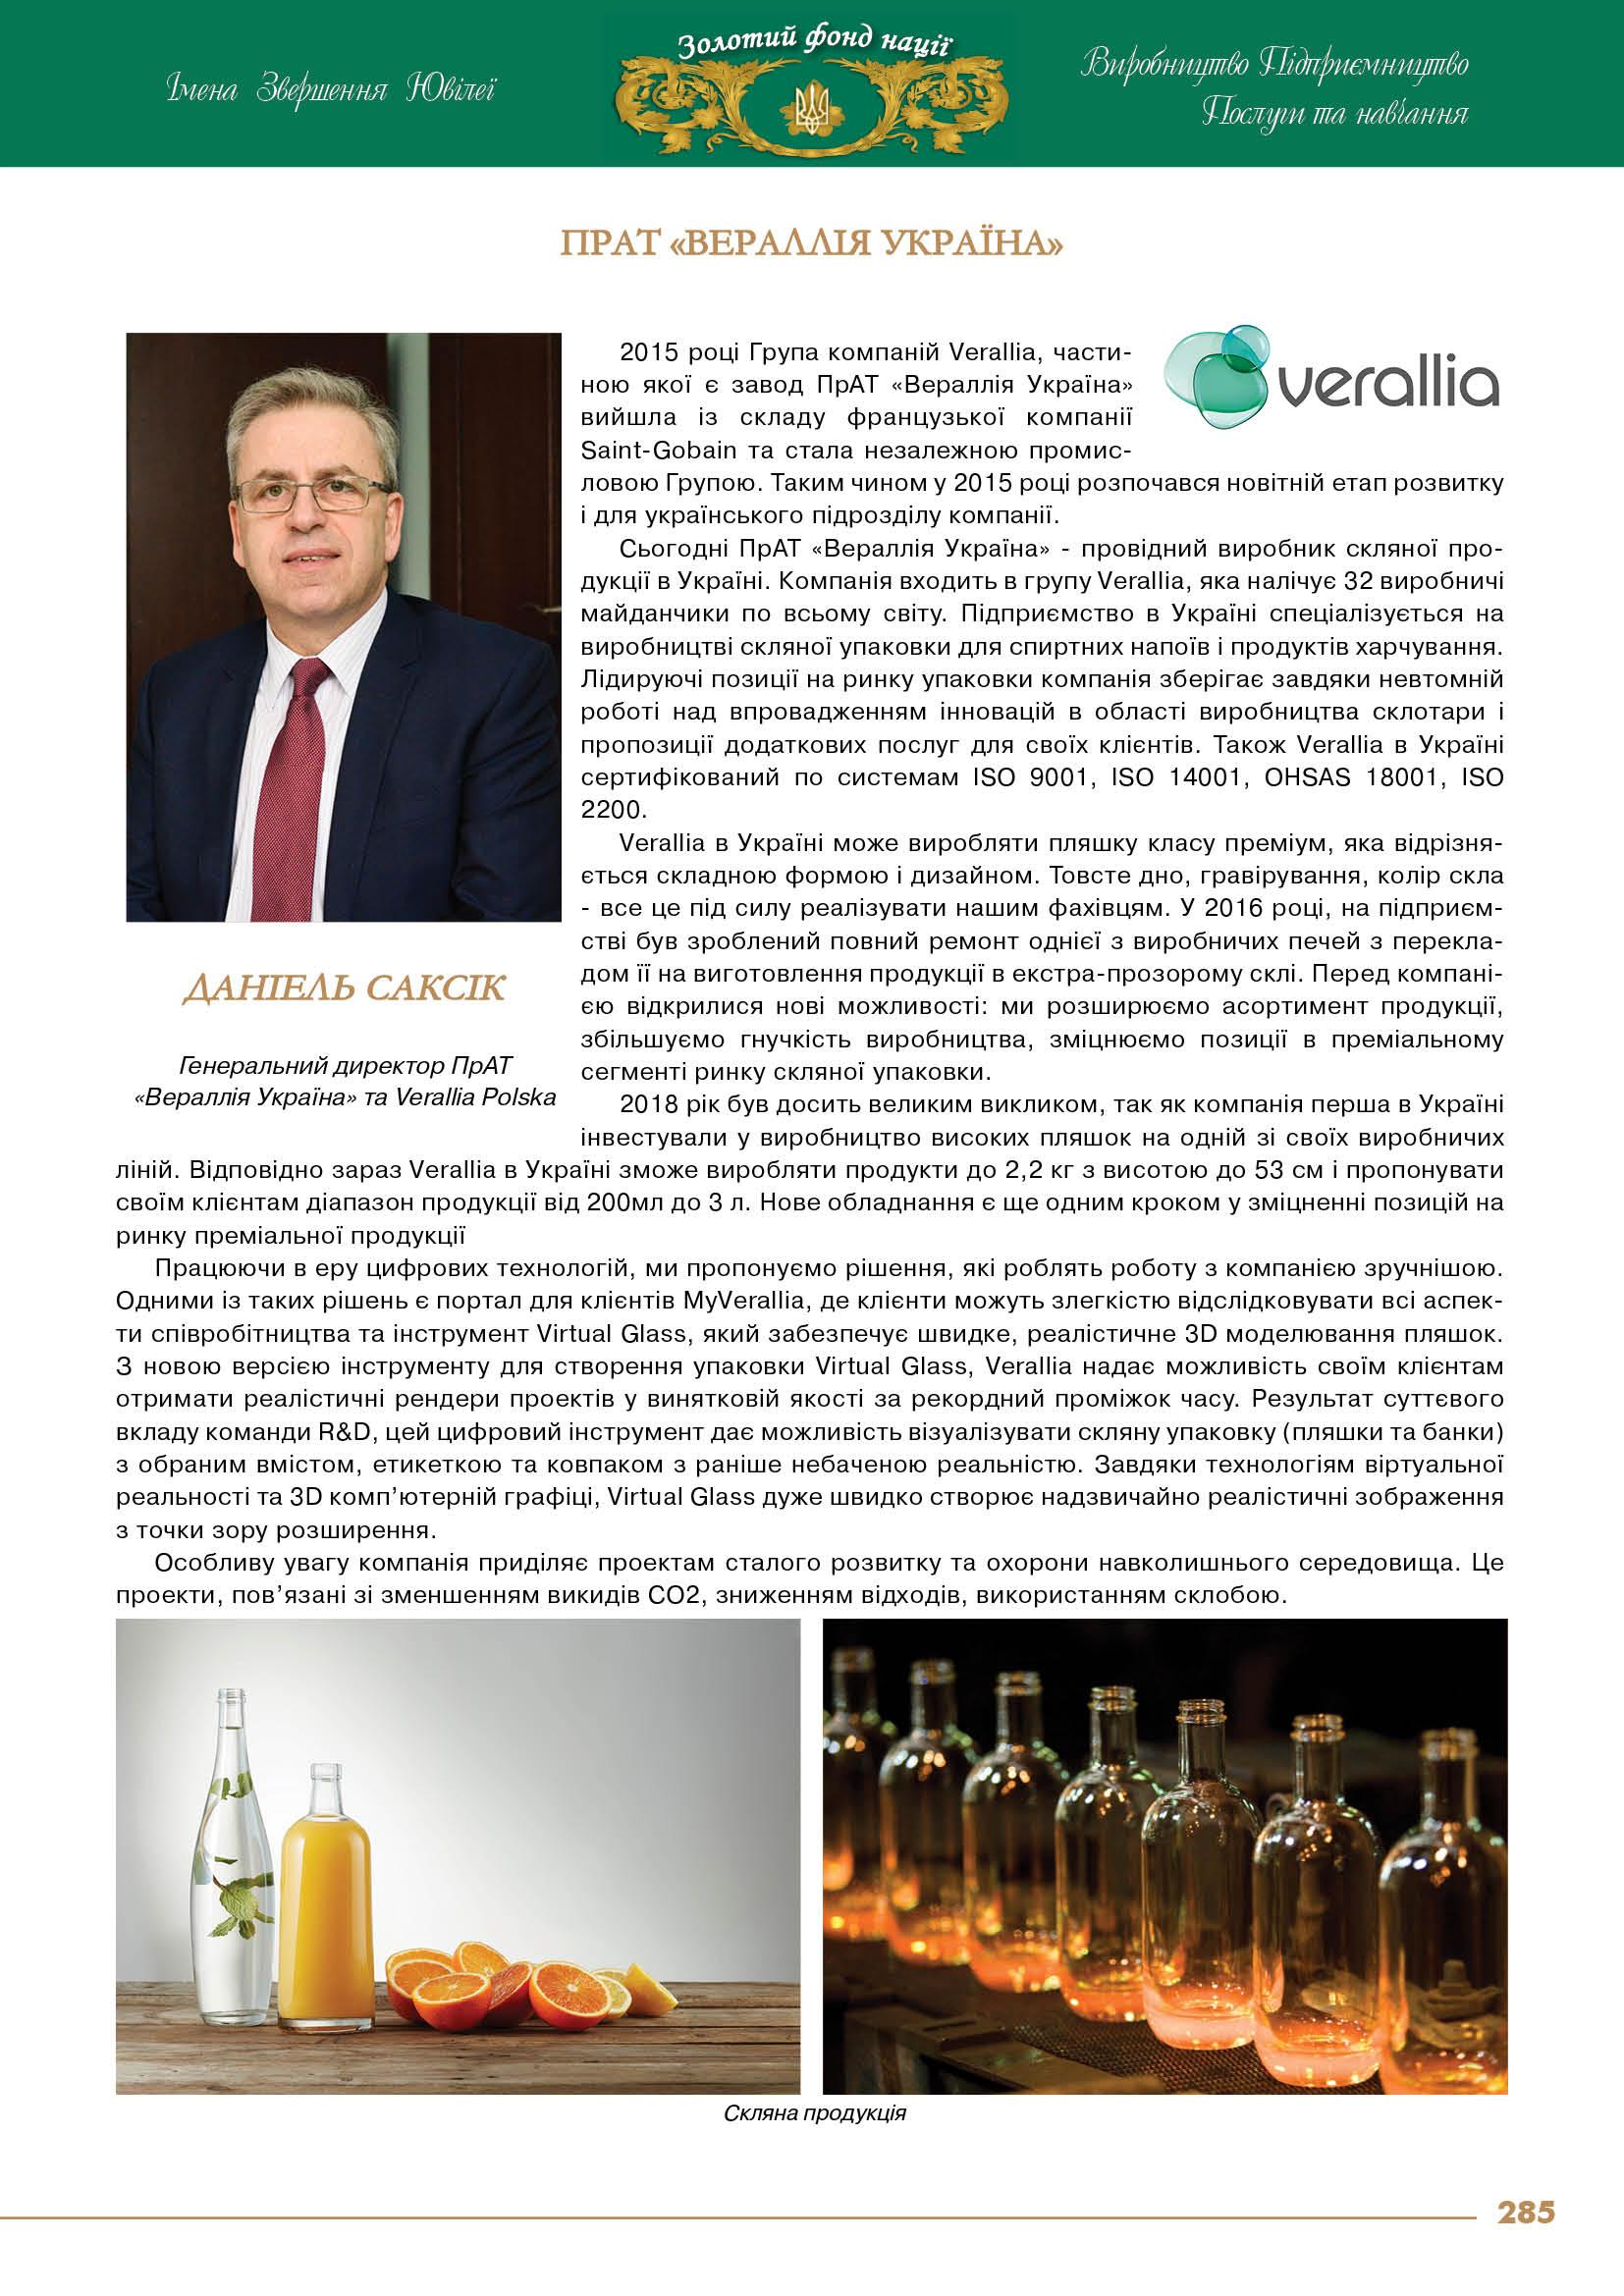 ПрАТ «Вераллія Україна» - генеральний директор Даніель Саксік